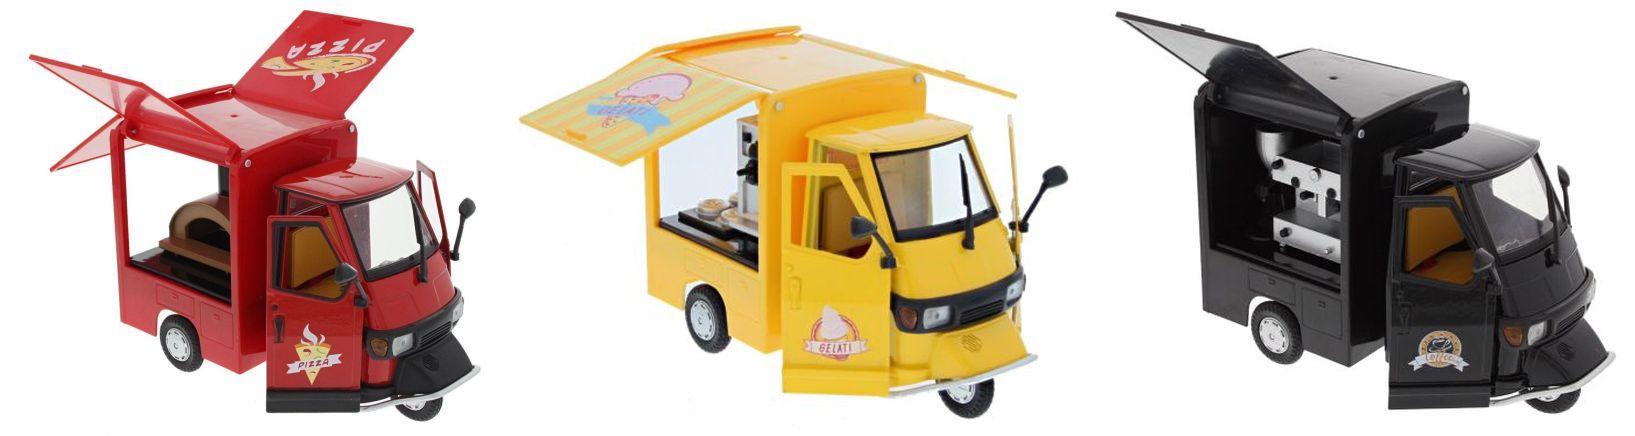 68043B-2-Modell-Piaggio-Ape-50-Verkaufswagen-Eis-Gelati-gelb-NewRay-wms24de-pana